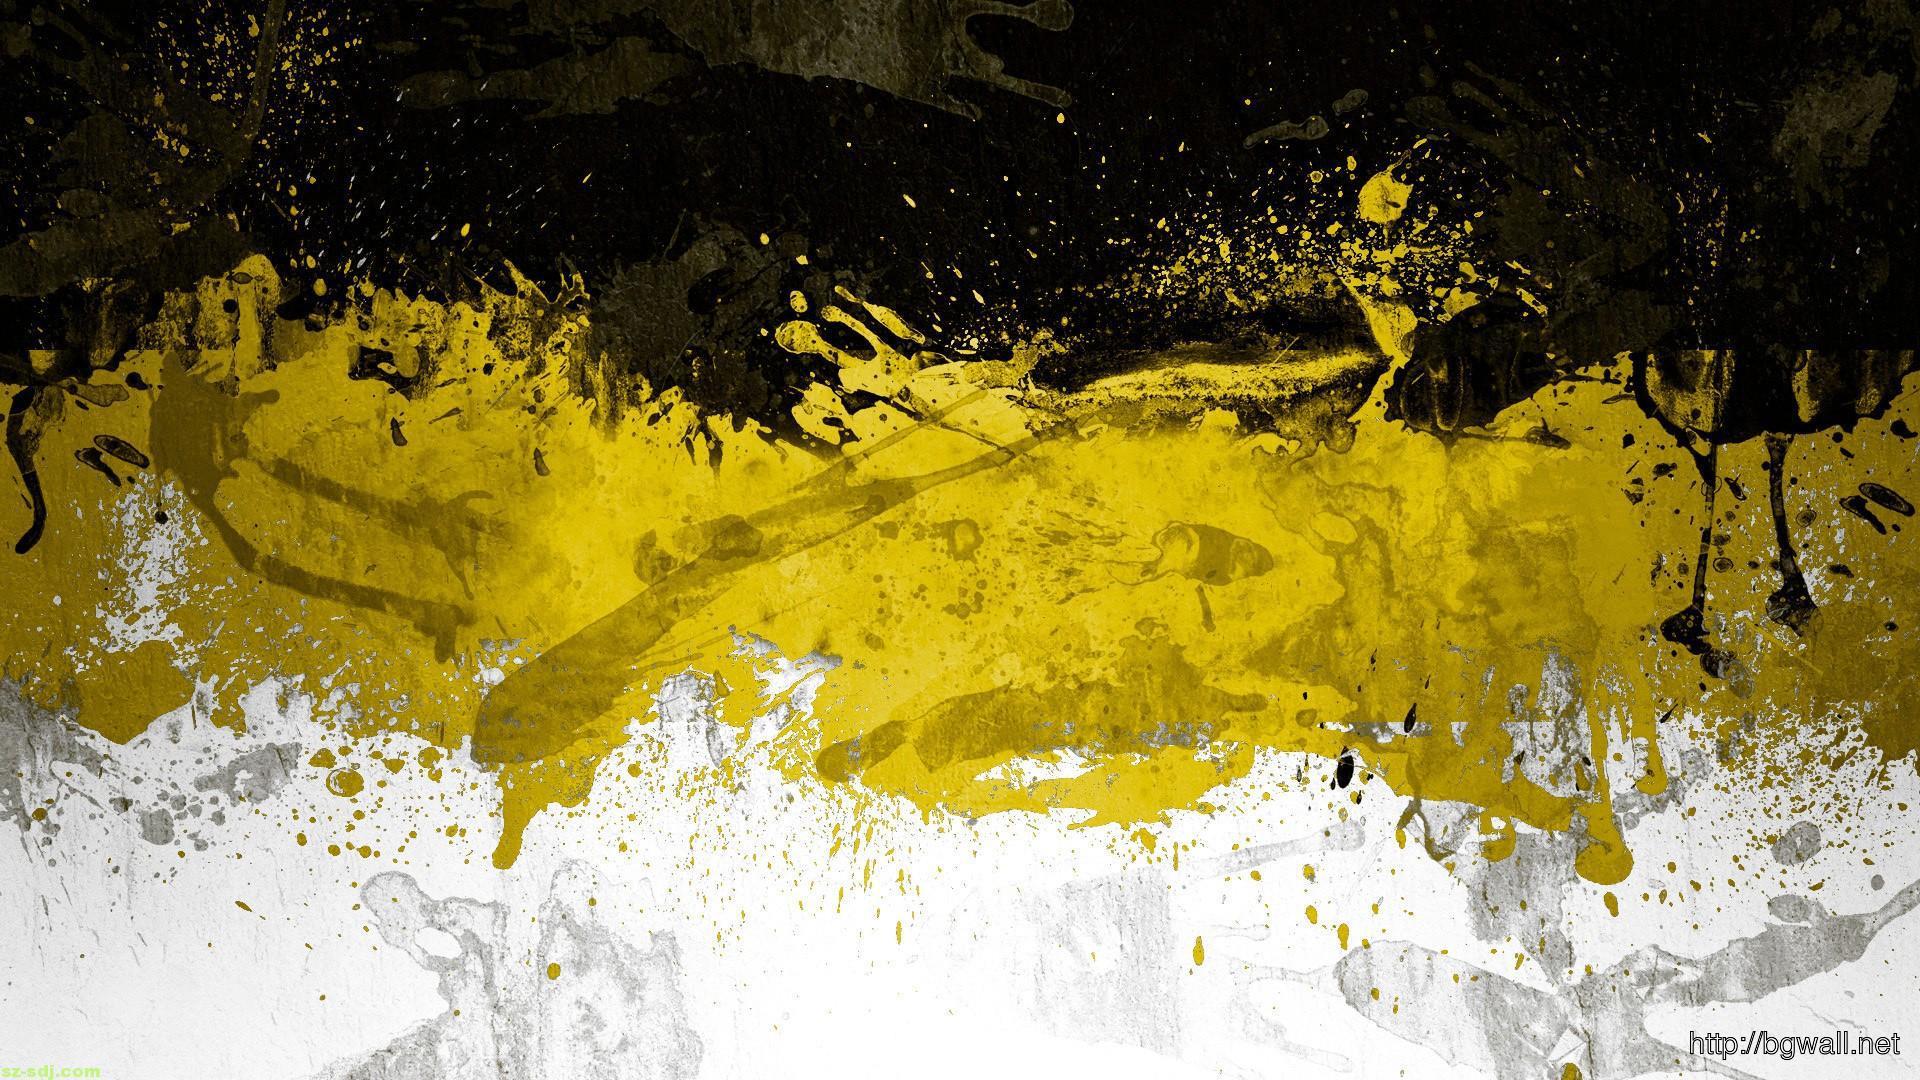 yellow abstract wallpaper hd - photo #32